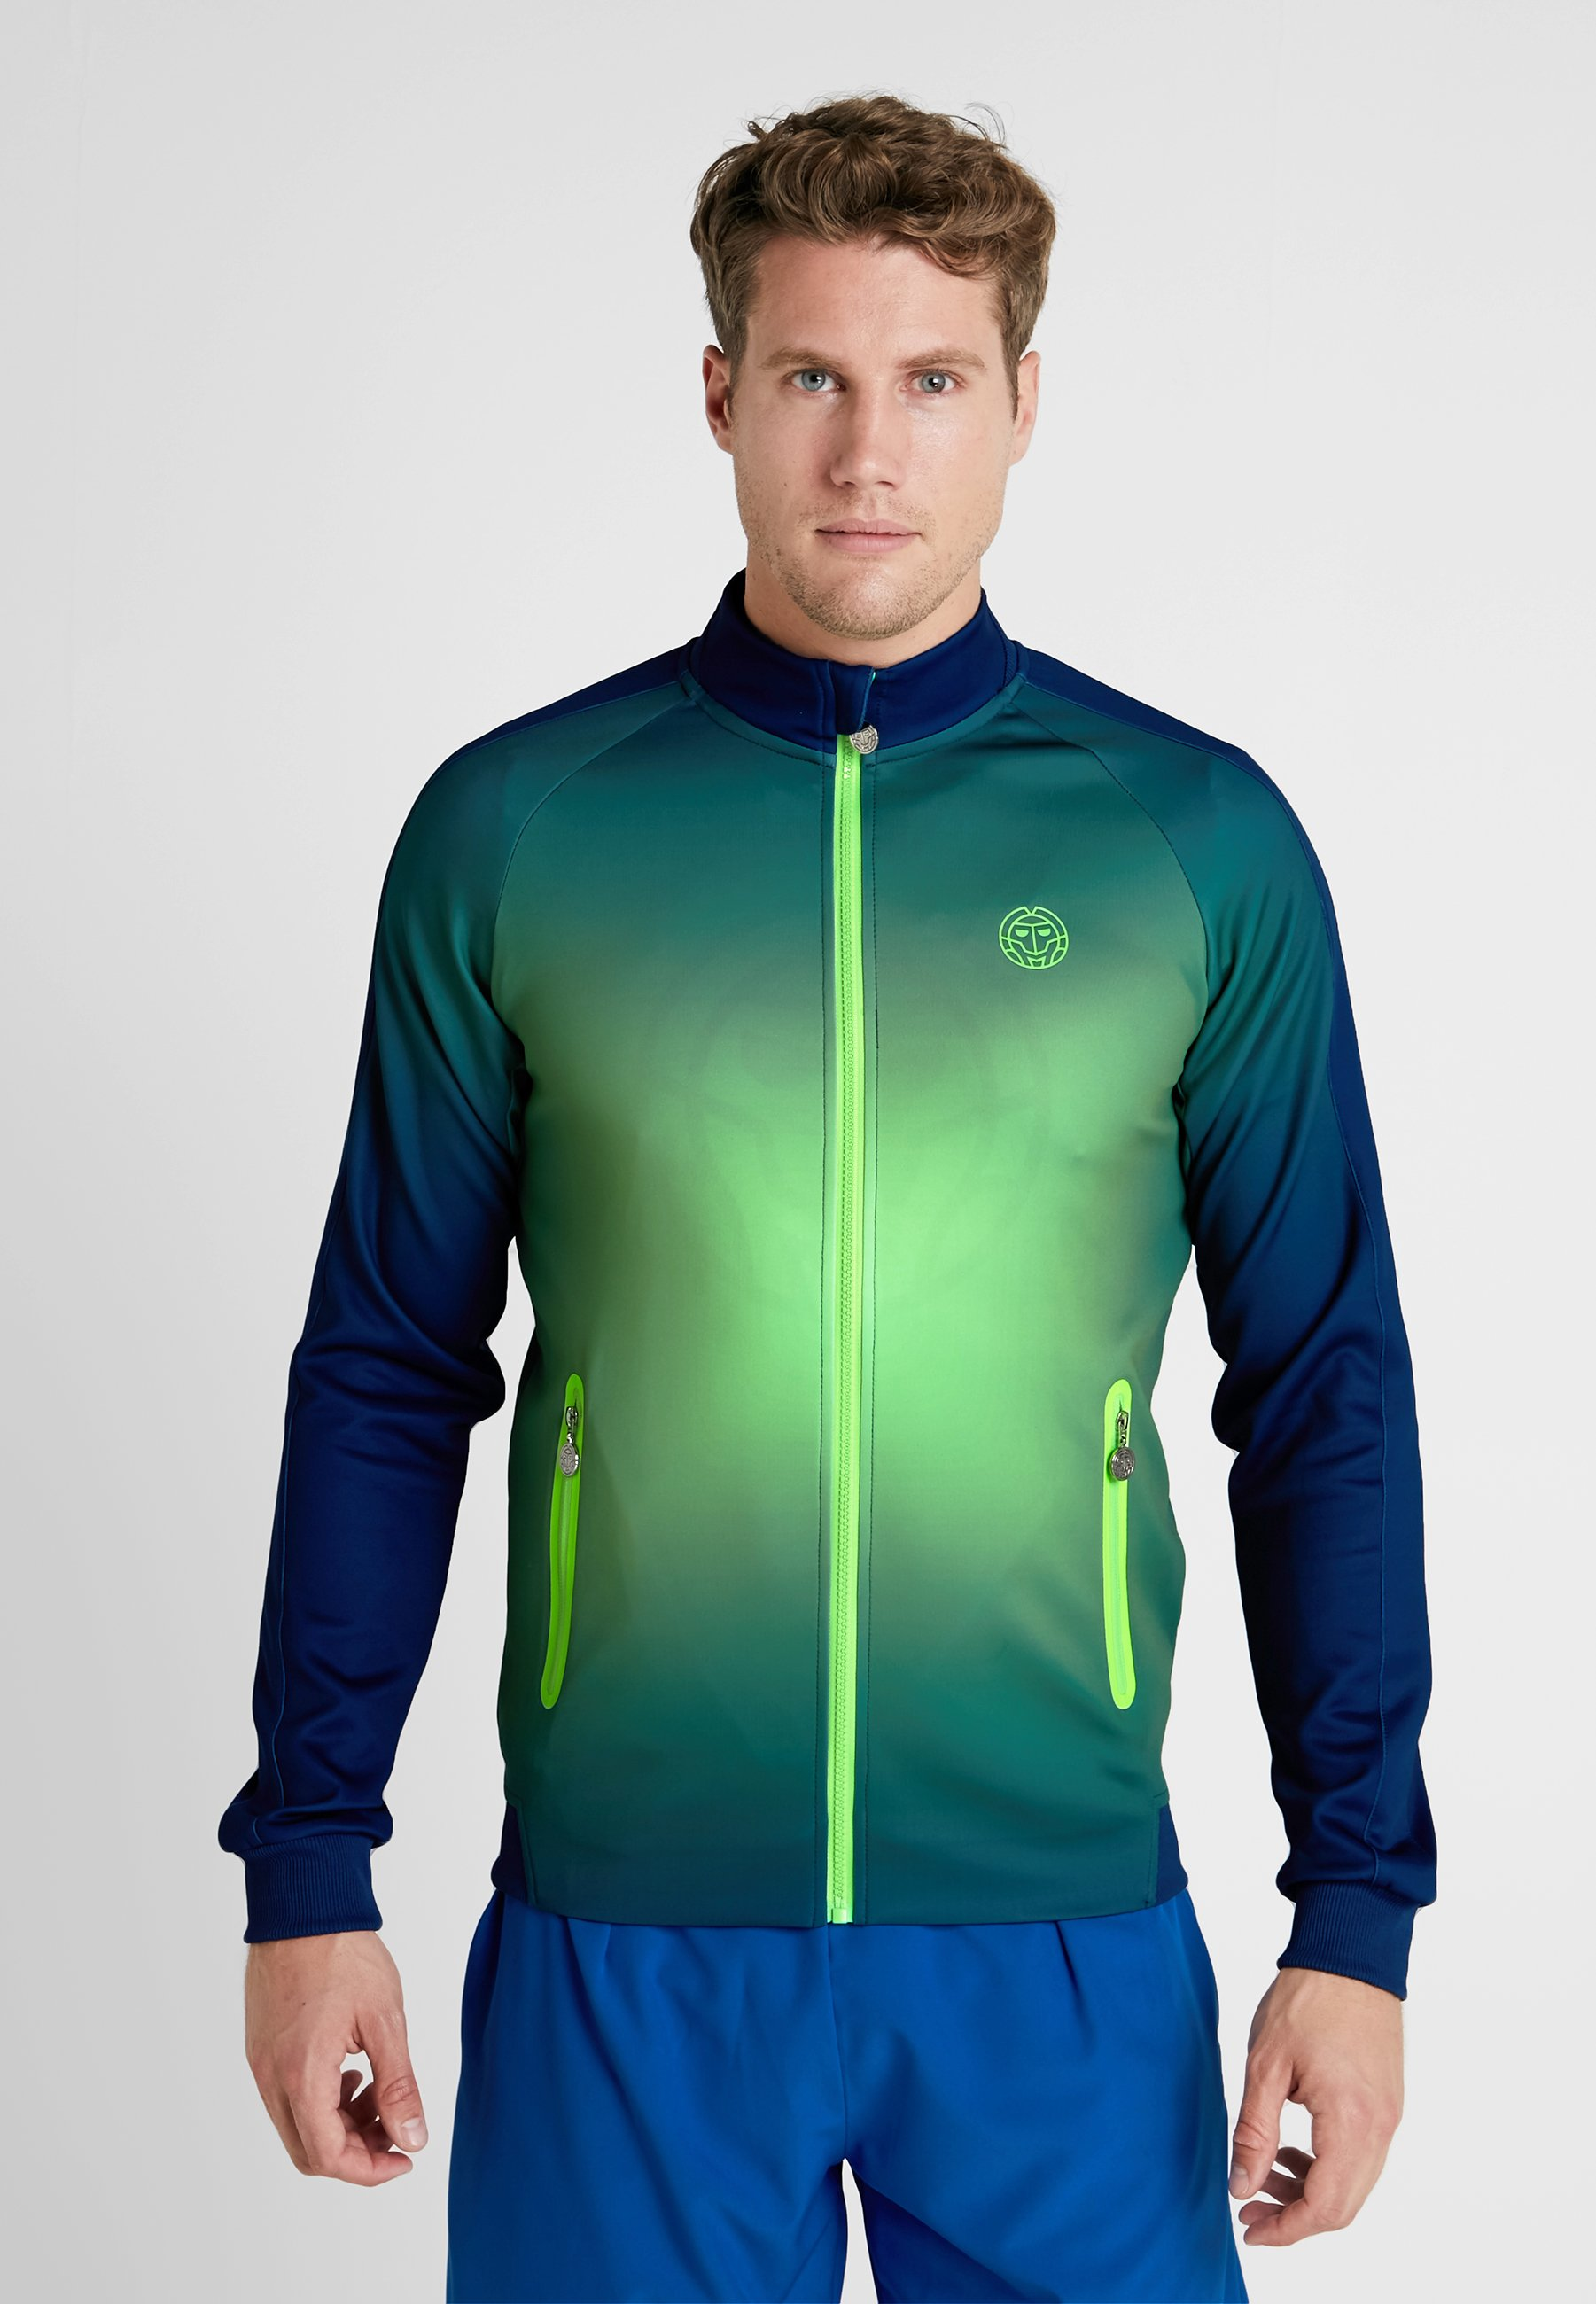 Bidi Veste SurvêtementDark Blue Green Badu De neon BedWorCx